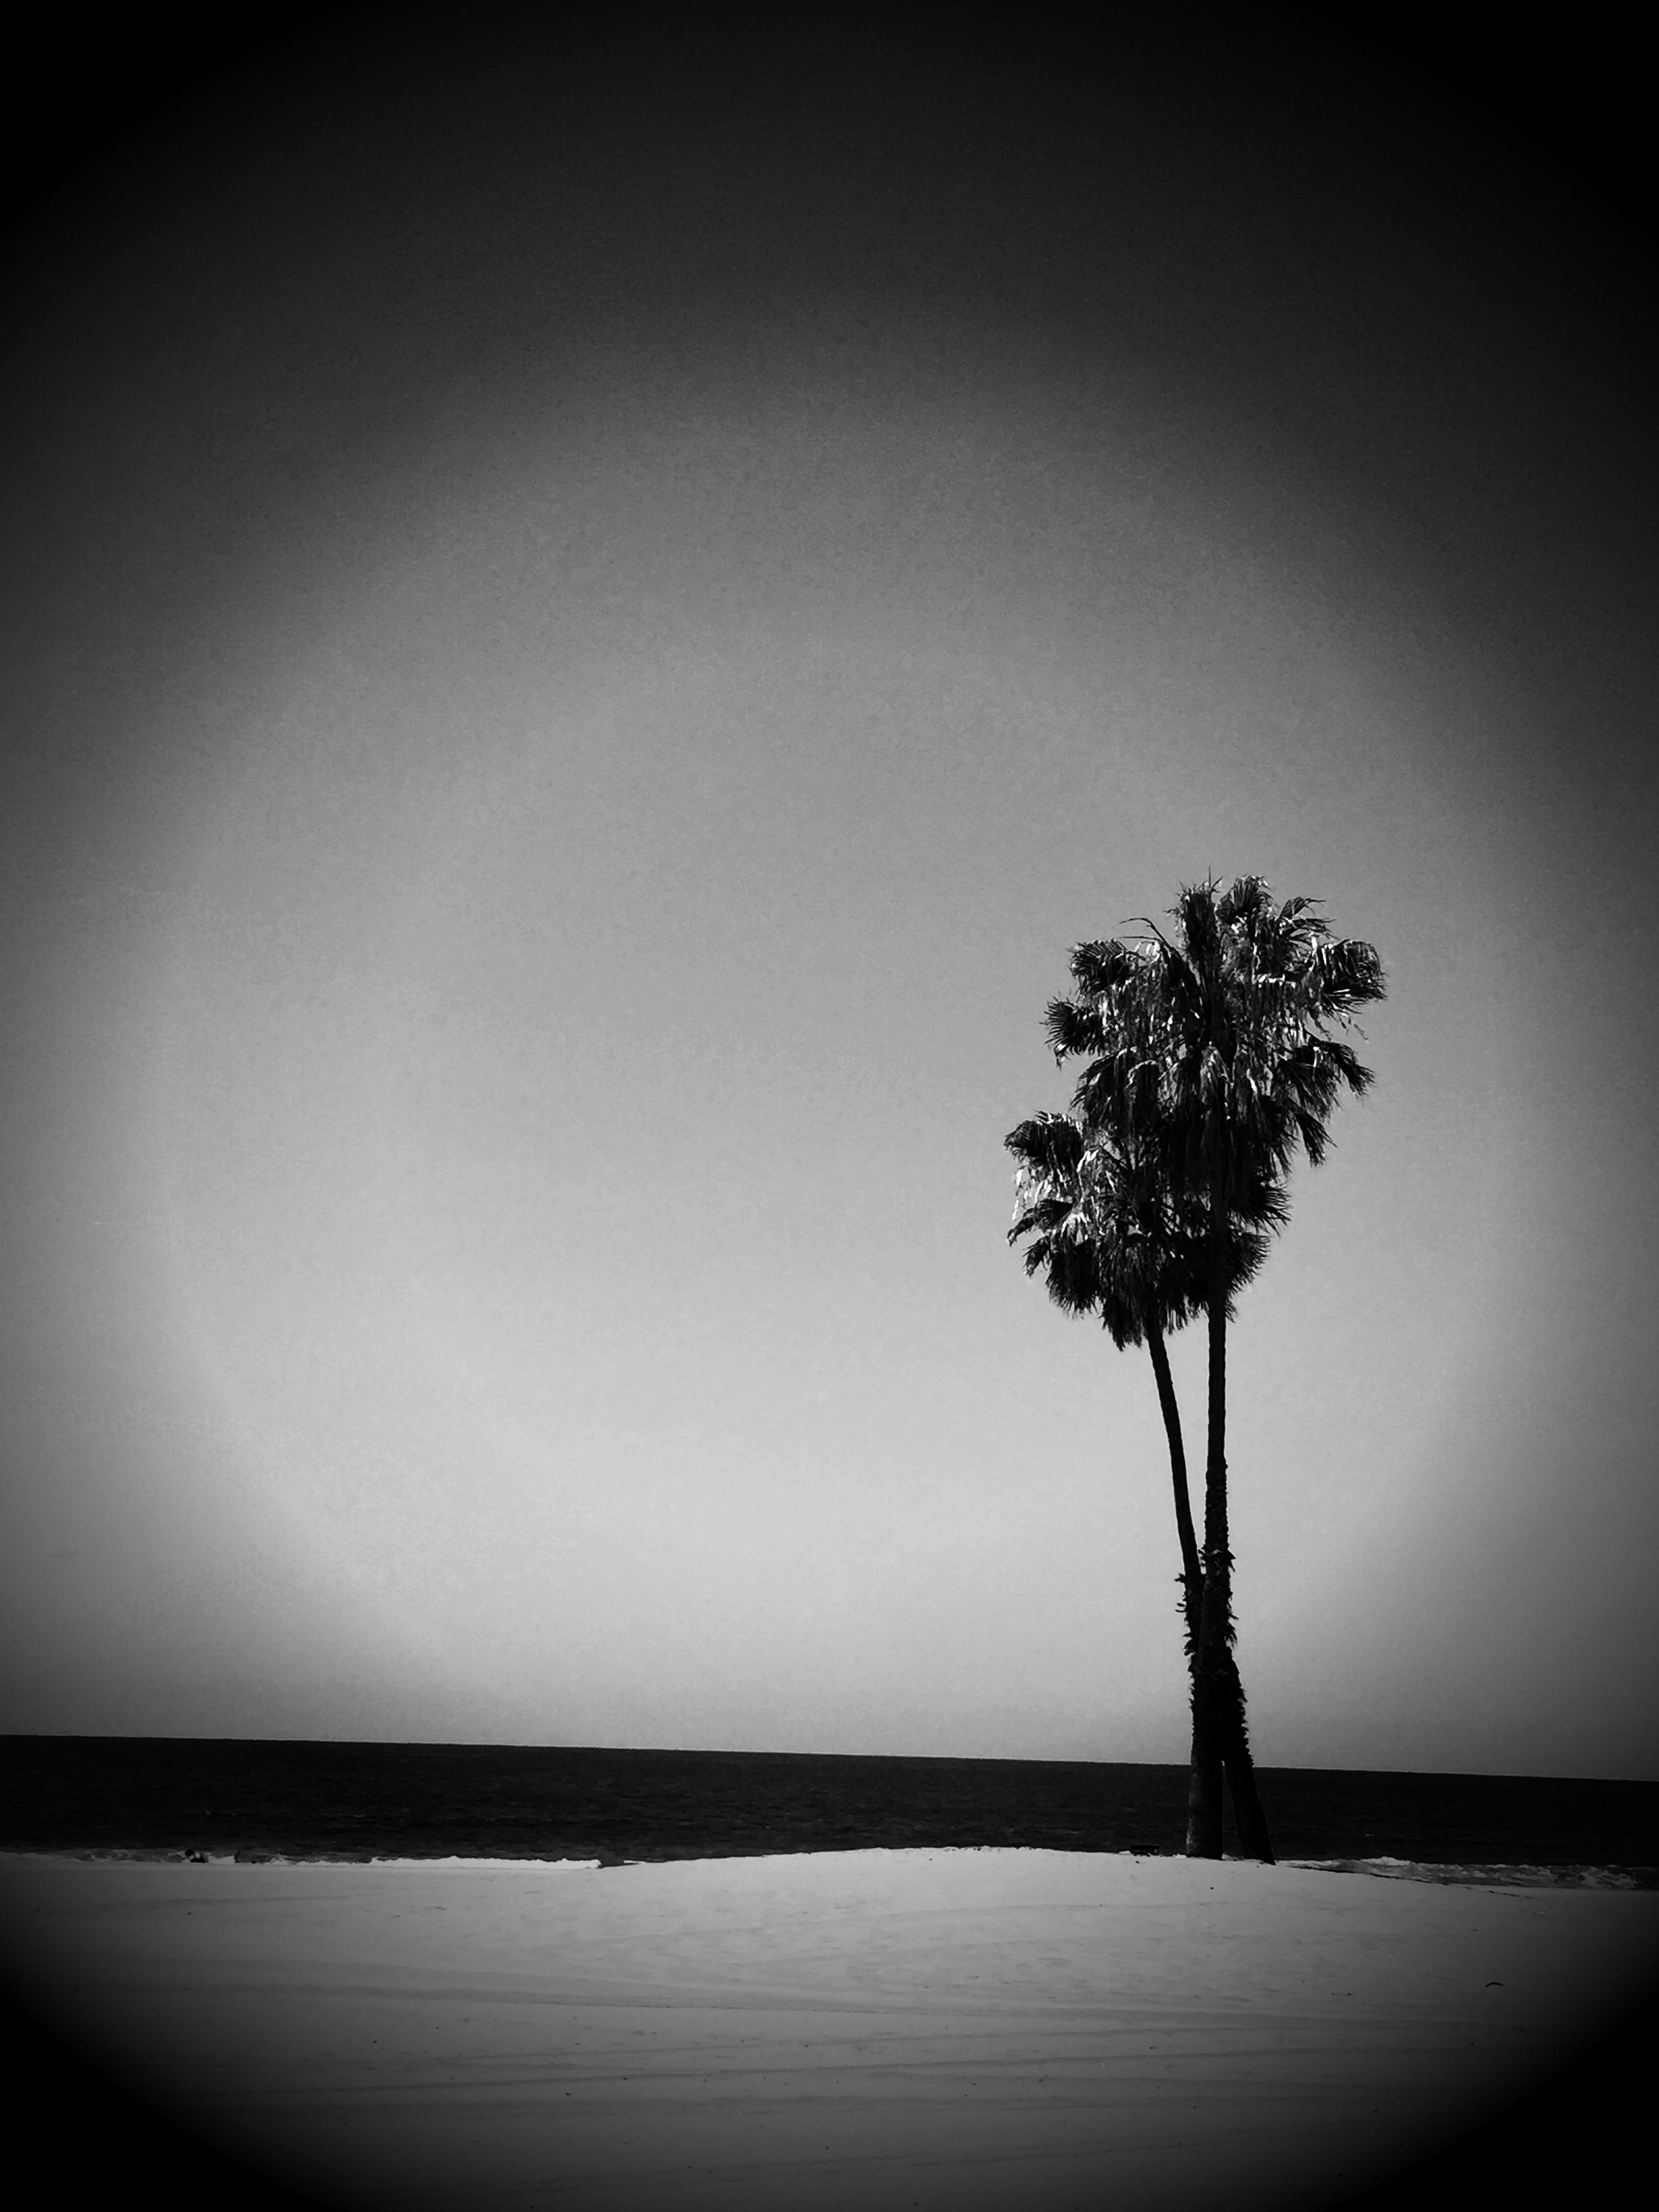 LOS ANGELES 05:15